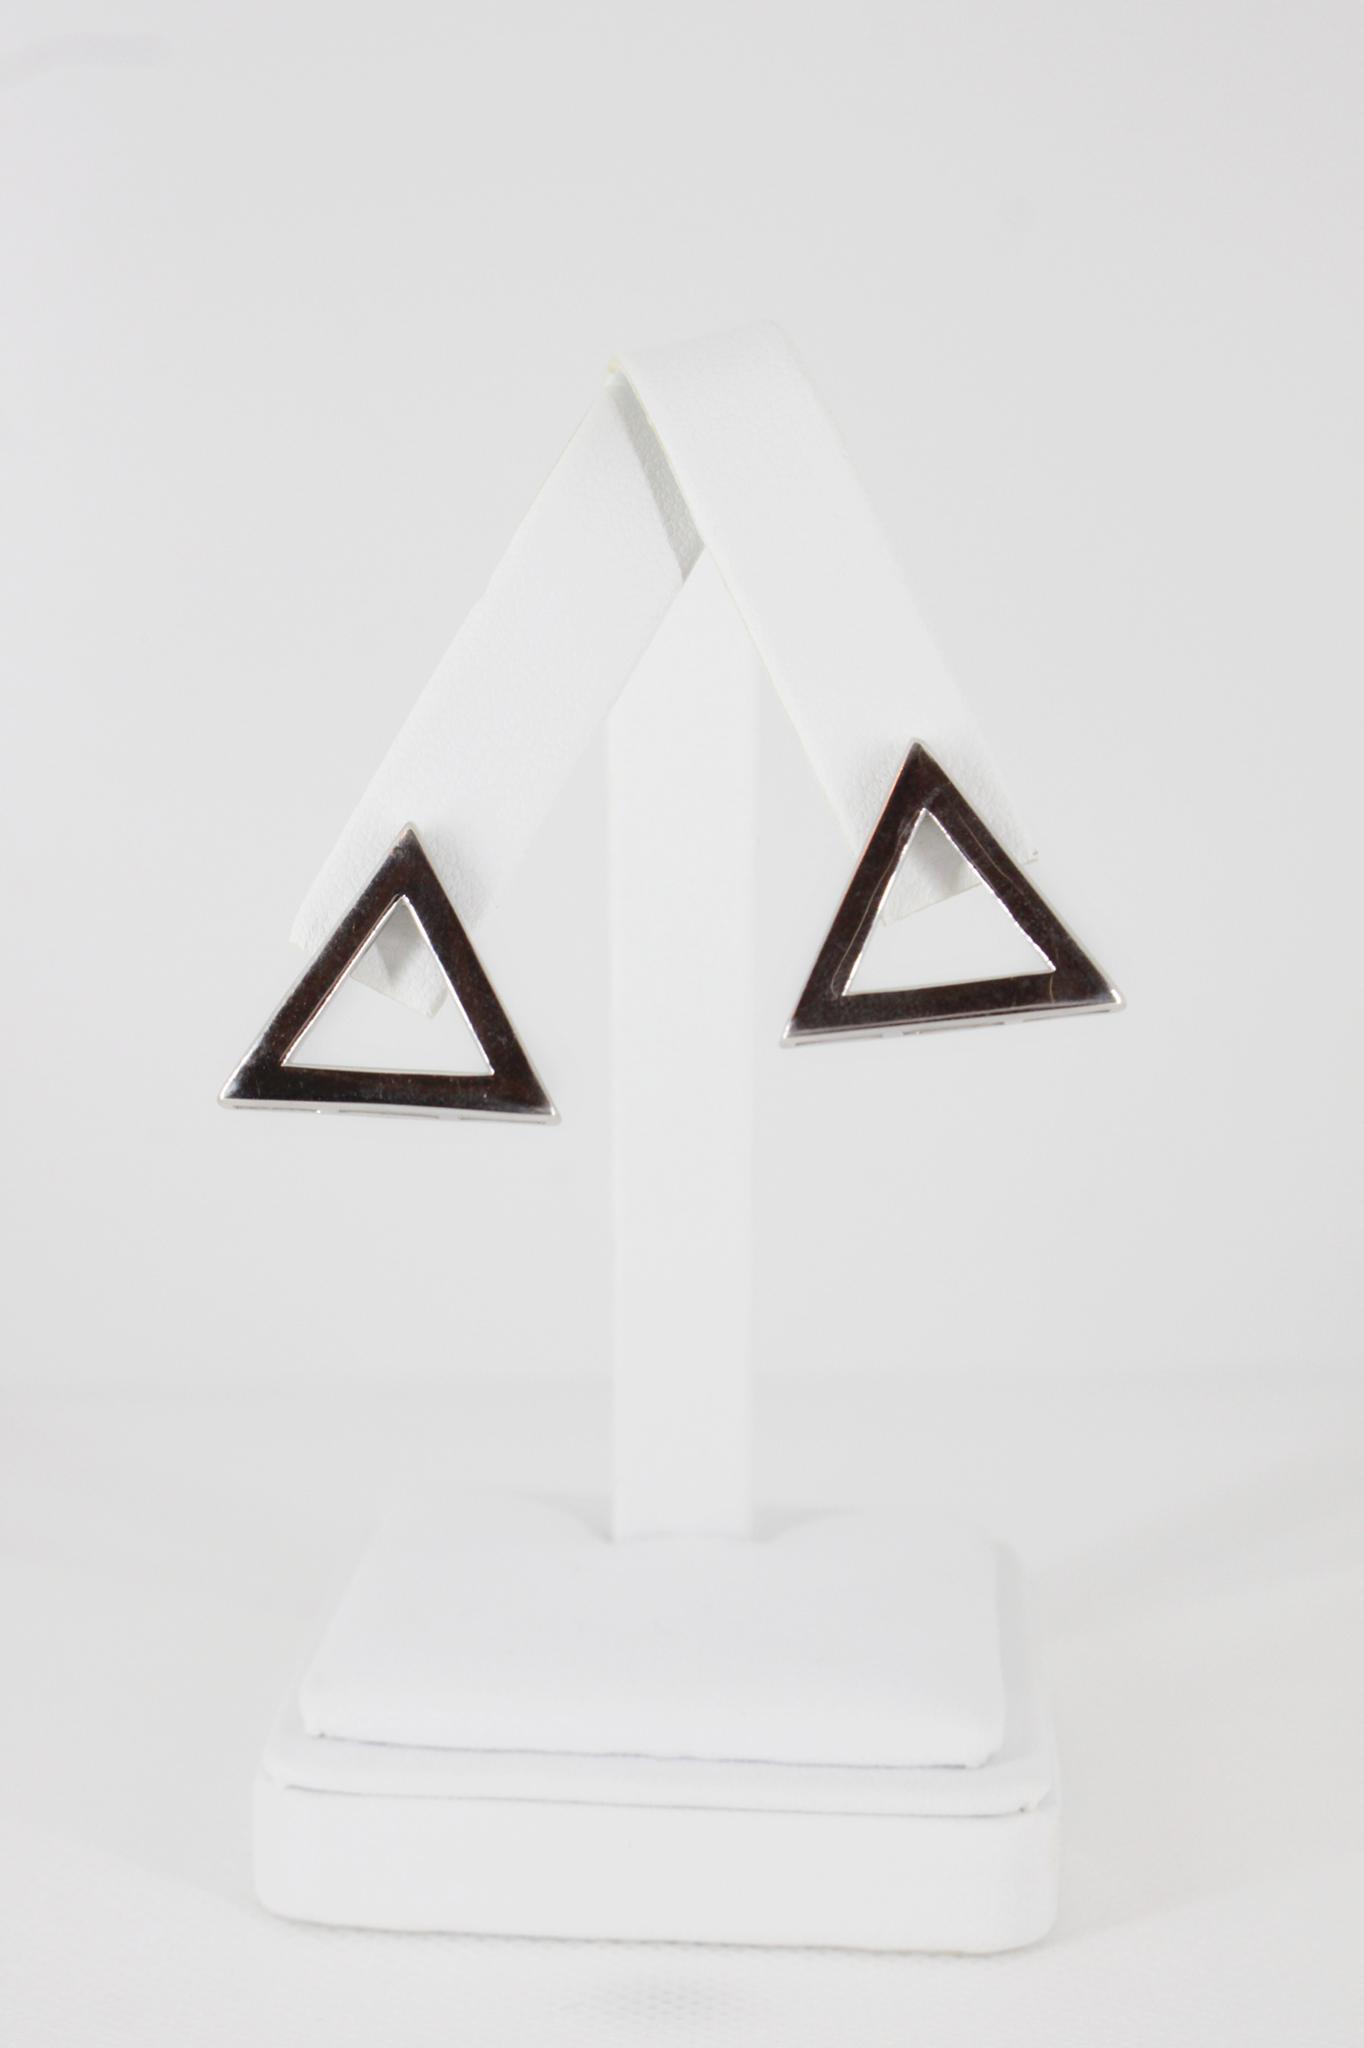 Sterling Plain 925 Pyramid Earrings